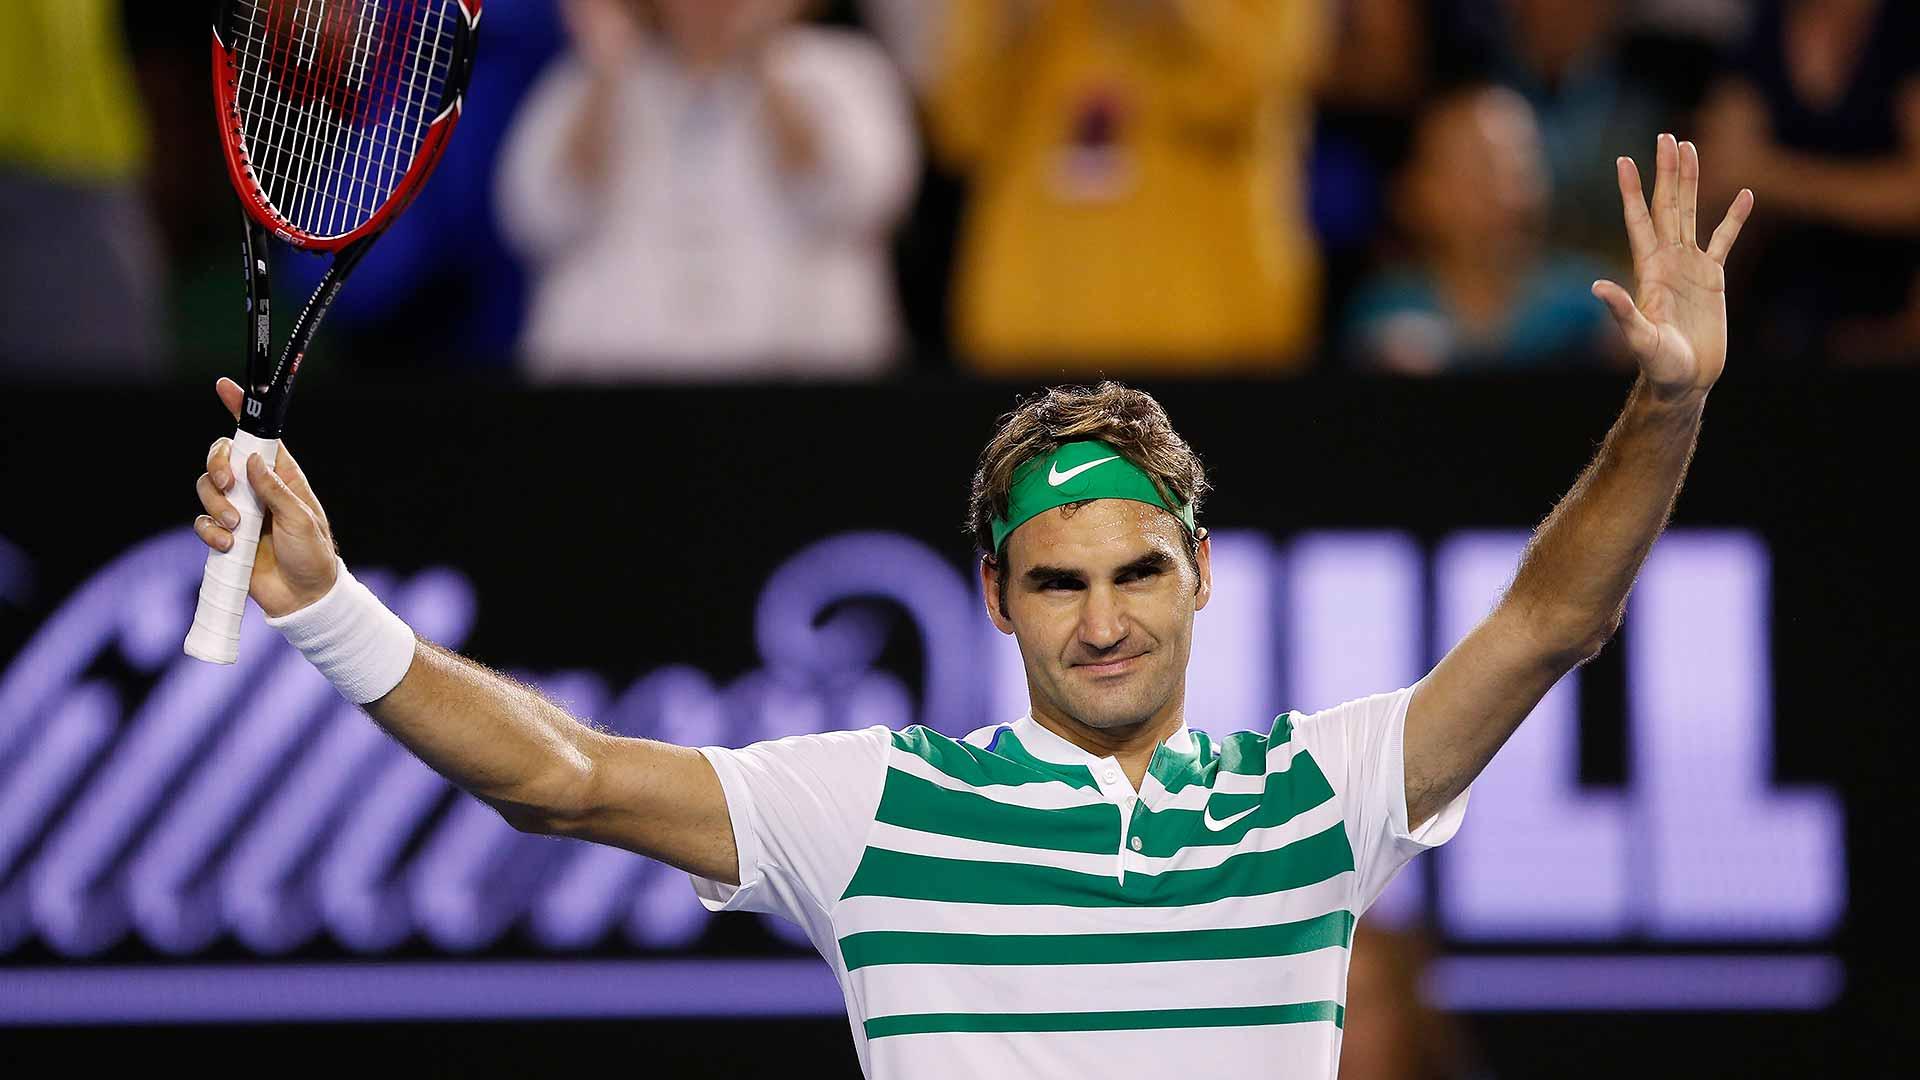 Federer at Australian Open 2009 defeating Berdych. Image Courtesy: ATPWorldTour